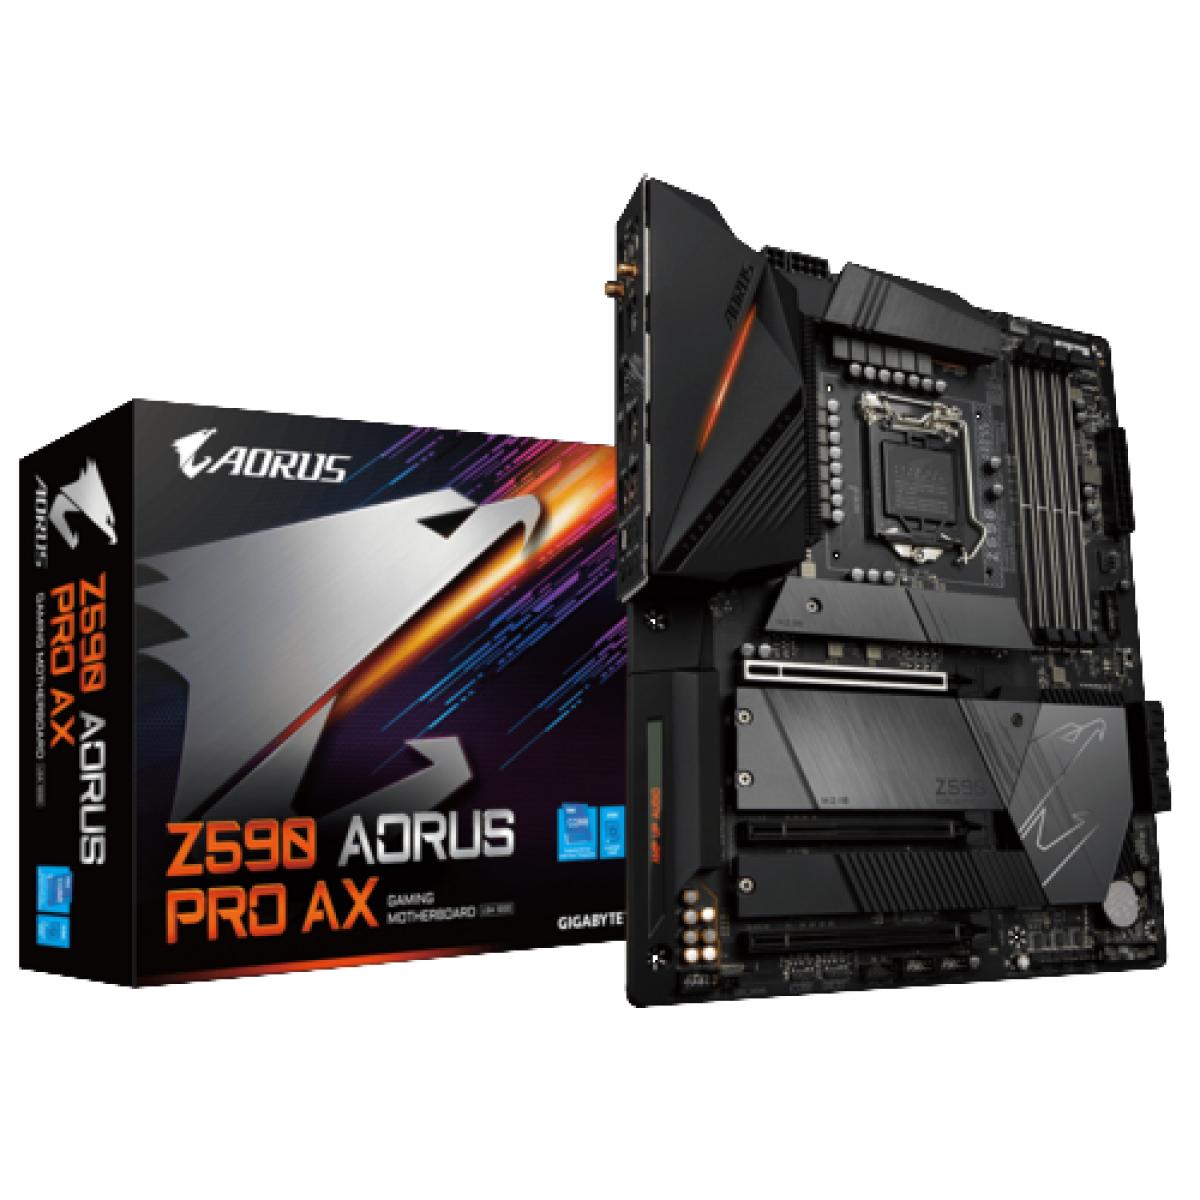 Placa Mãe GIGABYTE Z590 AORUS ULTRA (rev. 1.0), Chipset Z590 Express, Intel Socket 1200, ATX, DDR4